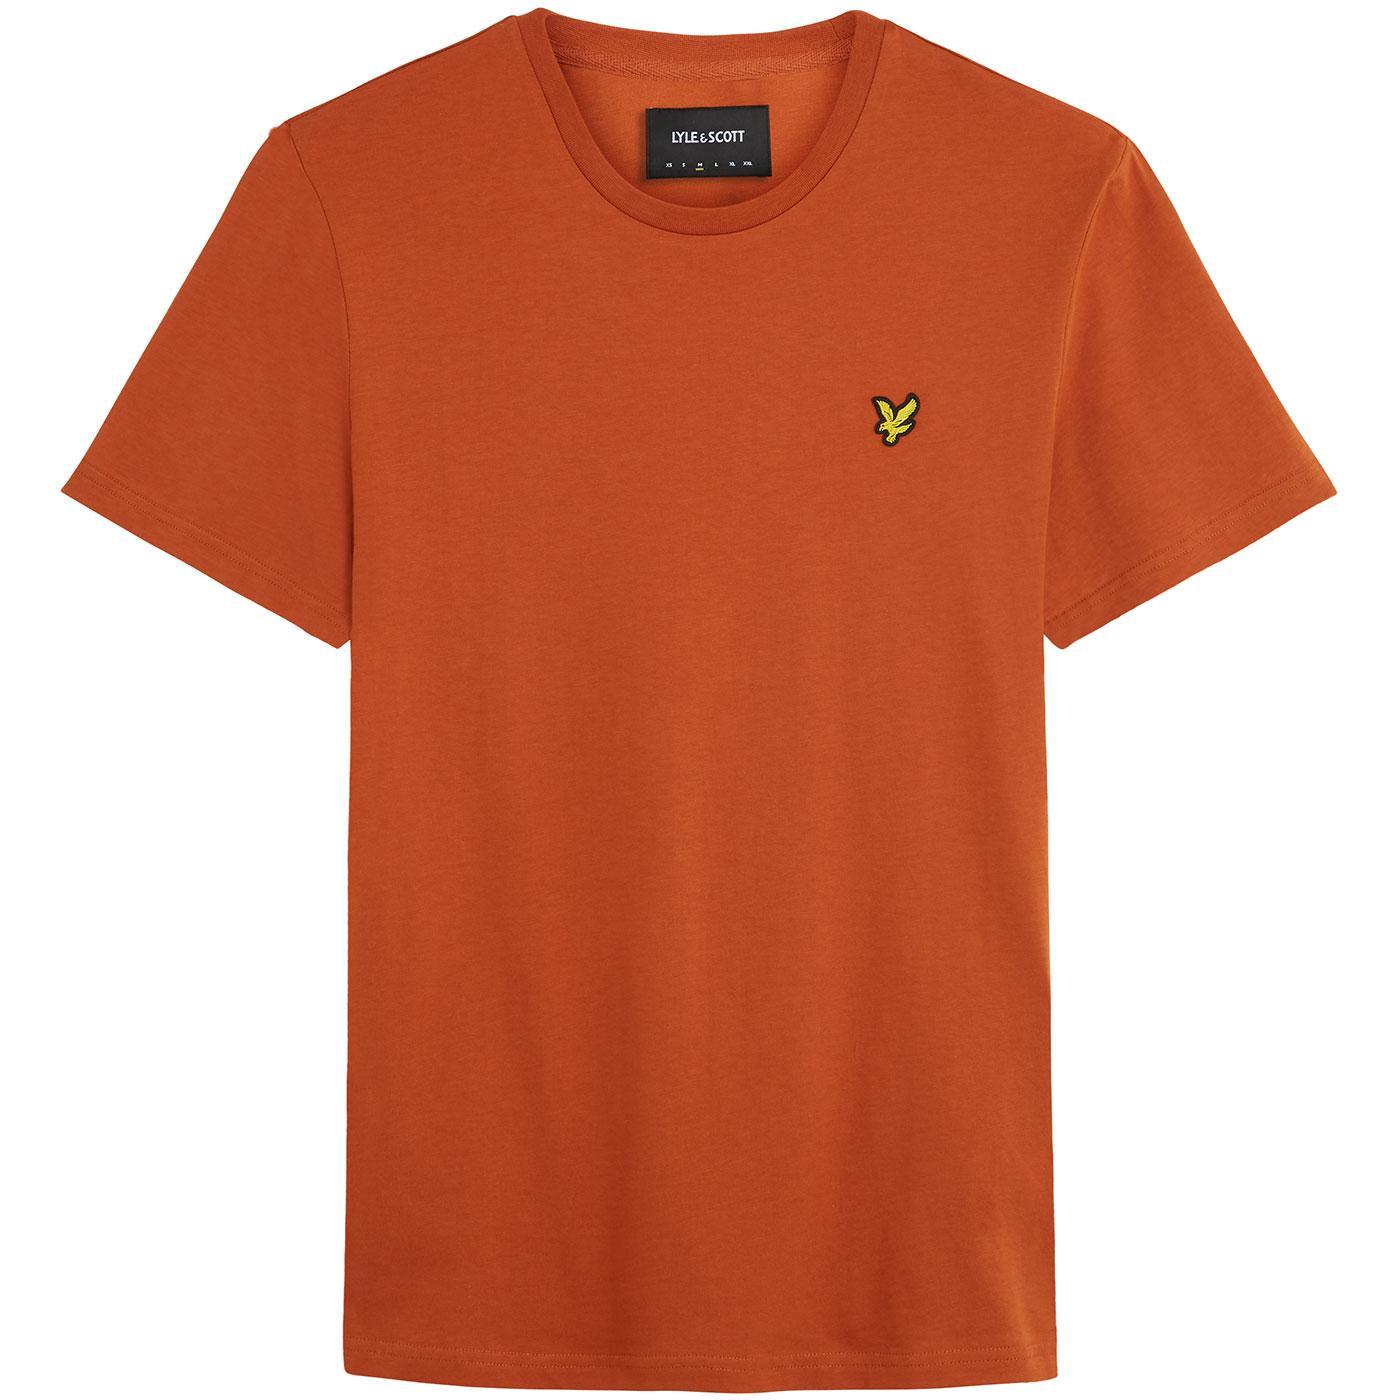 LYLE & SCOTT Men's Crew Neck T-Shirt (Tabacco)